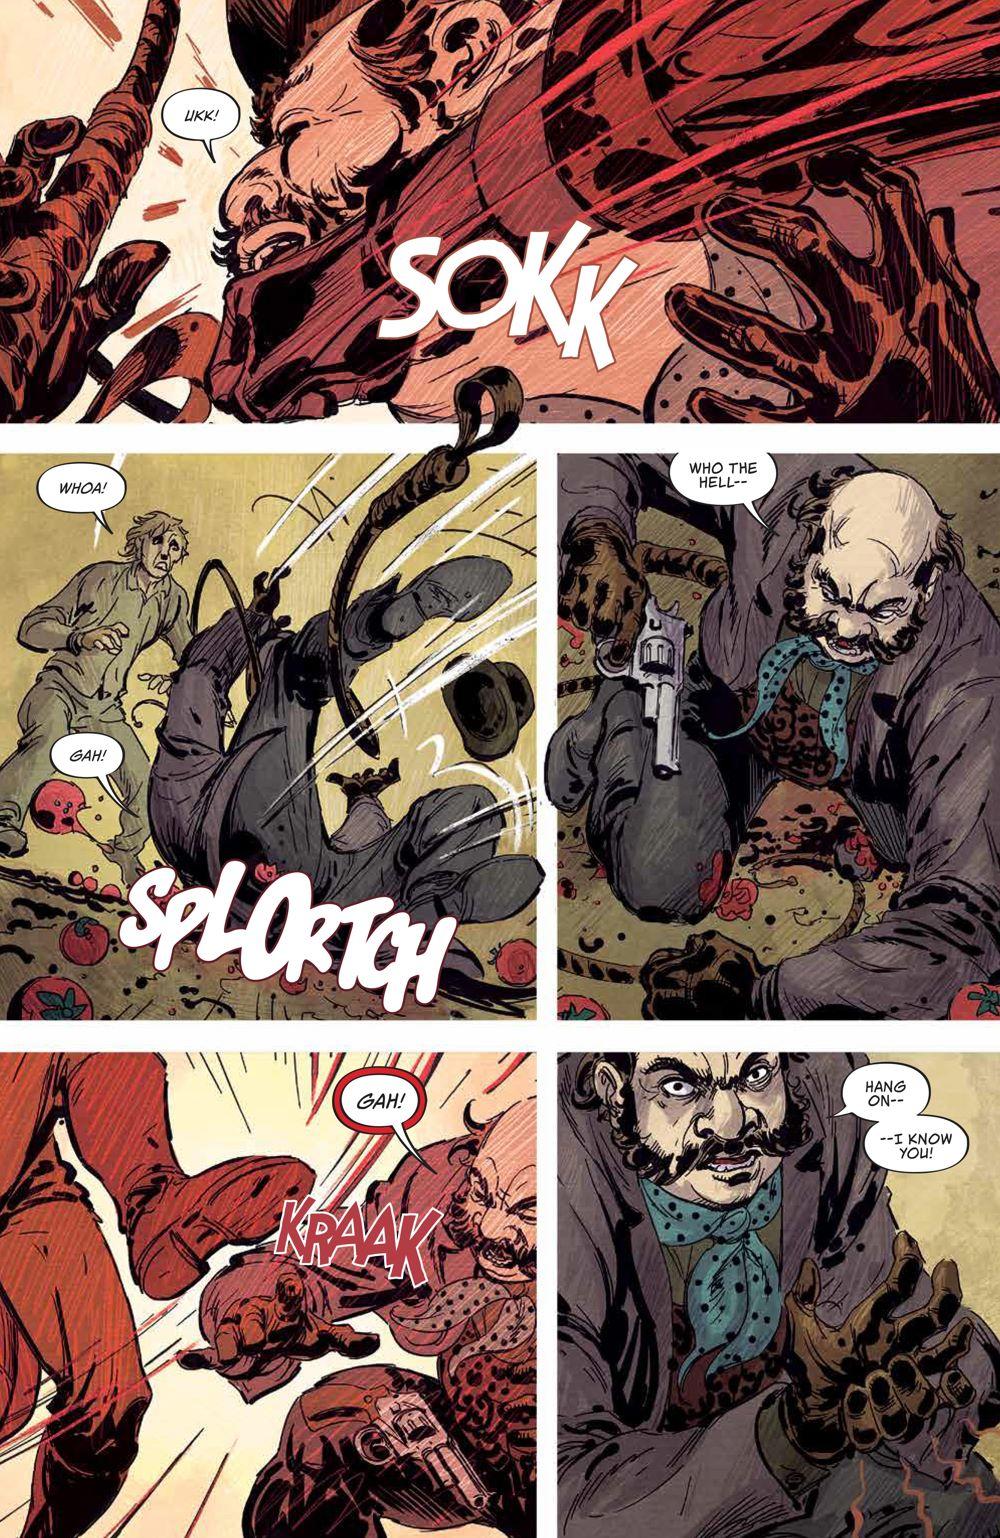 Firefly_NewSheriffVerse_v1_HC_PRESS_54 ComicList Previews: FIREFLY NEW SHERIFF IN THE 'VERSE VOLUME 1 HC